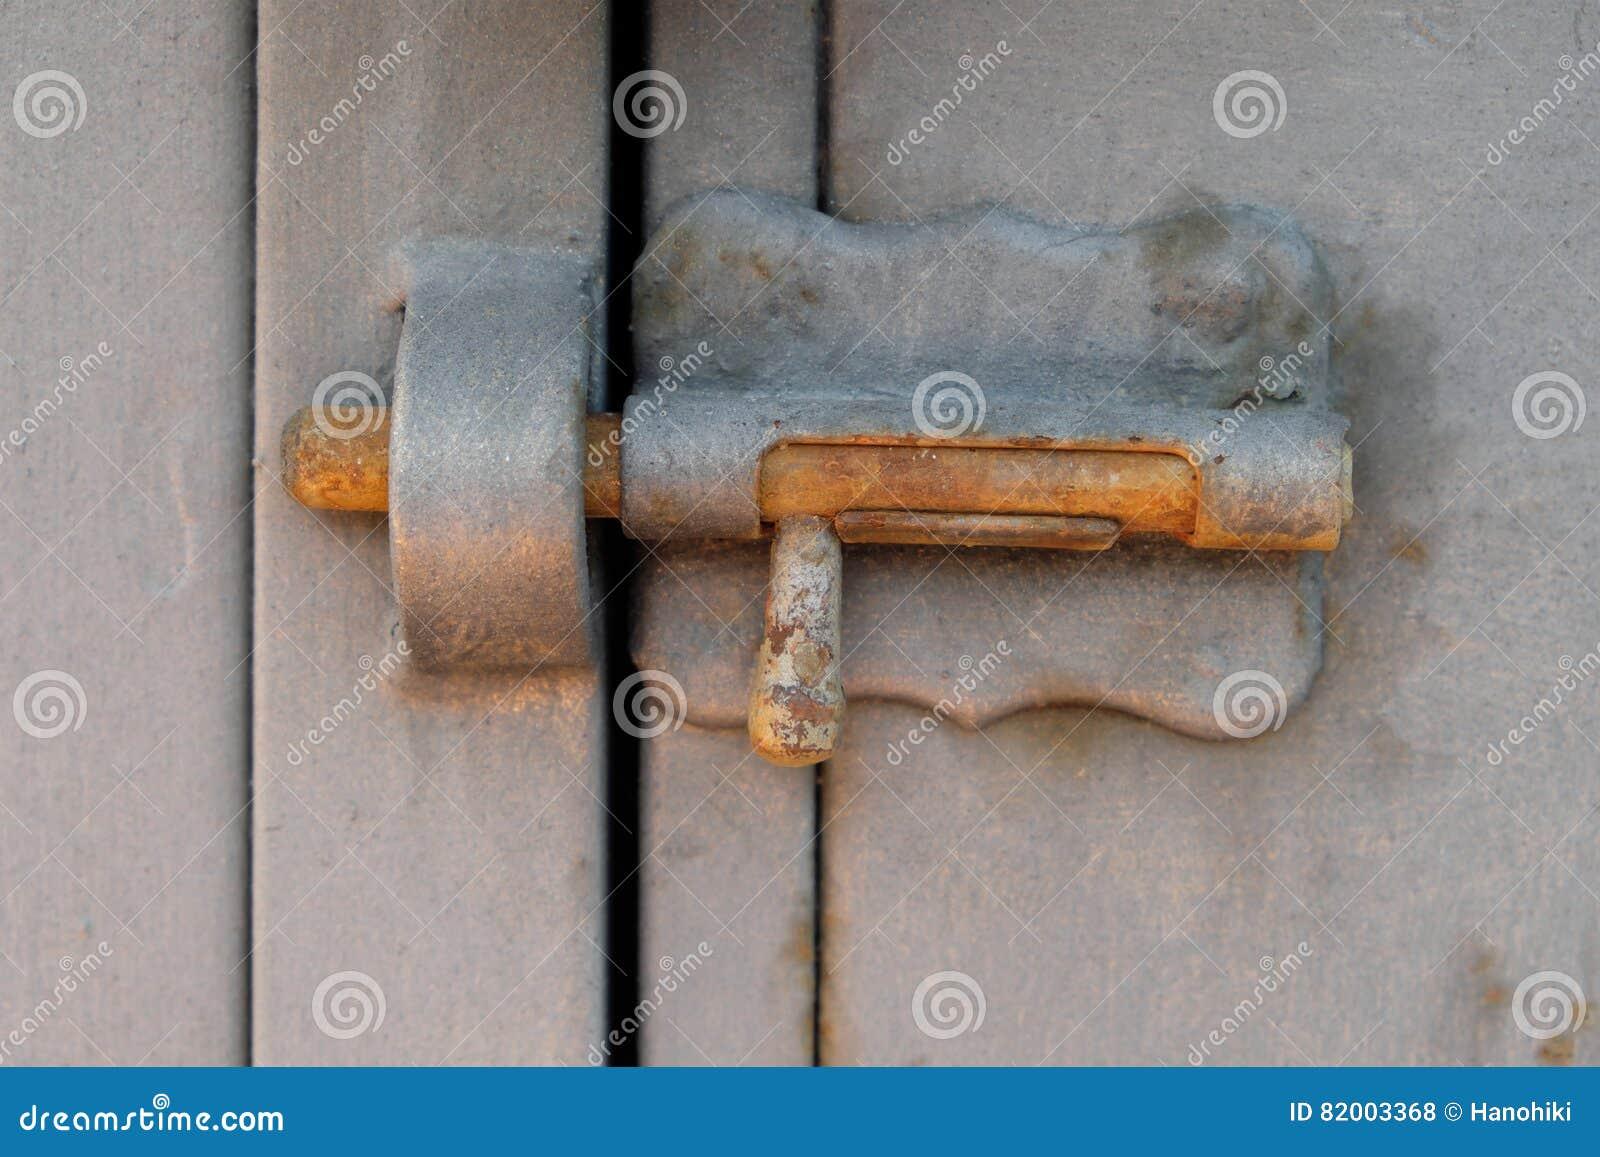 Verschlossene tür  Weinlesemetall-ltch, Sperrbolzen, Verschlossene Tür Stockfoto ...